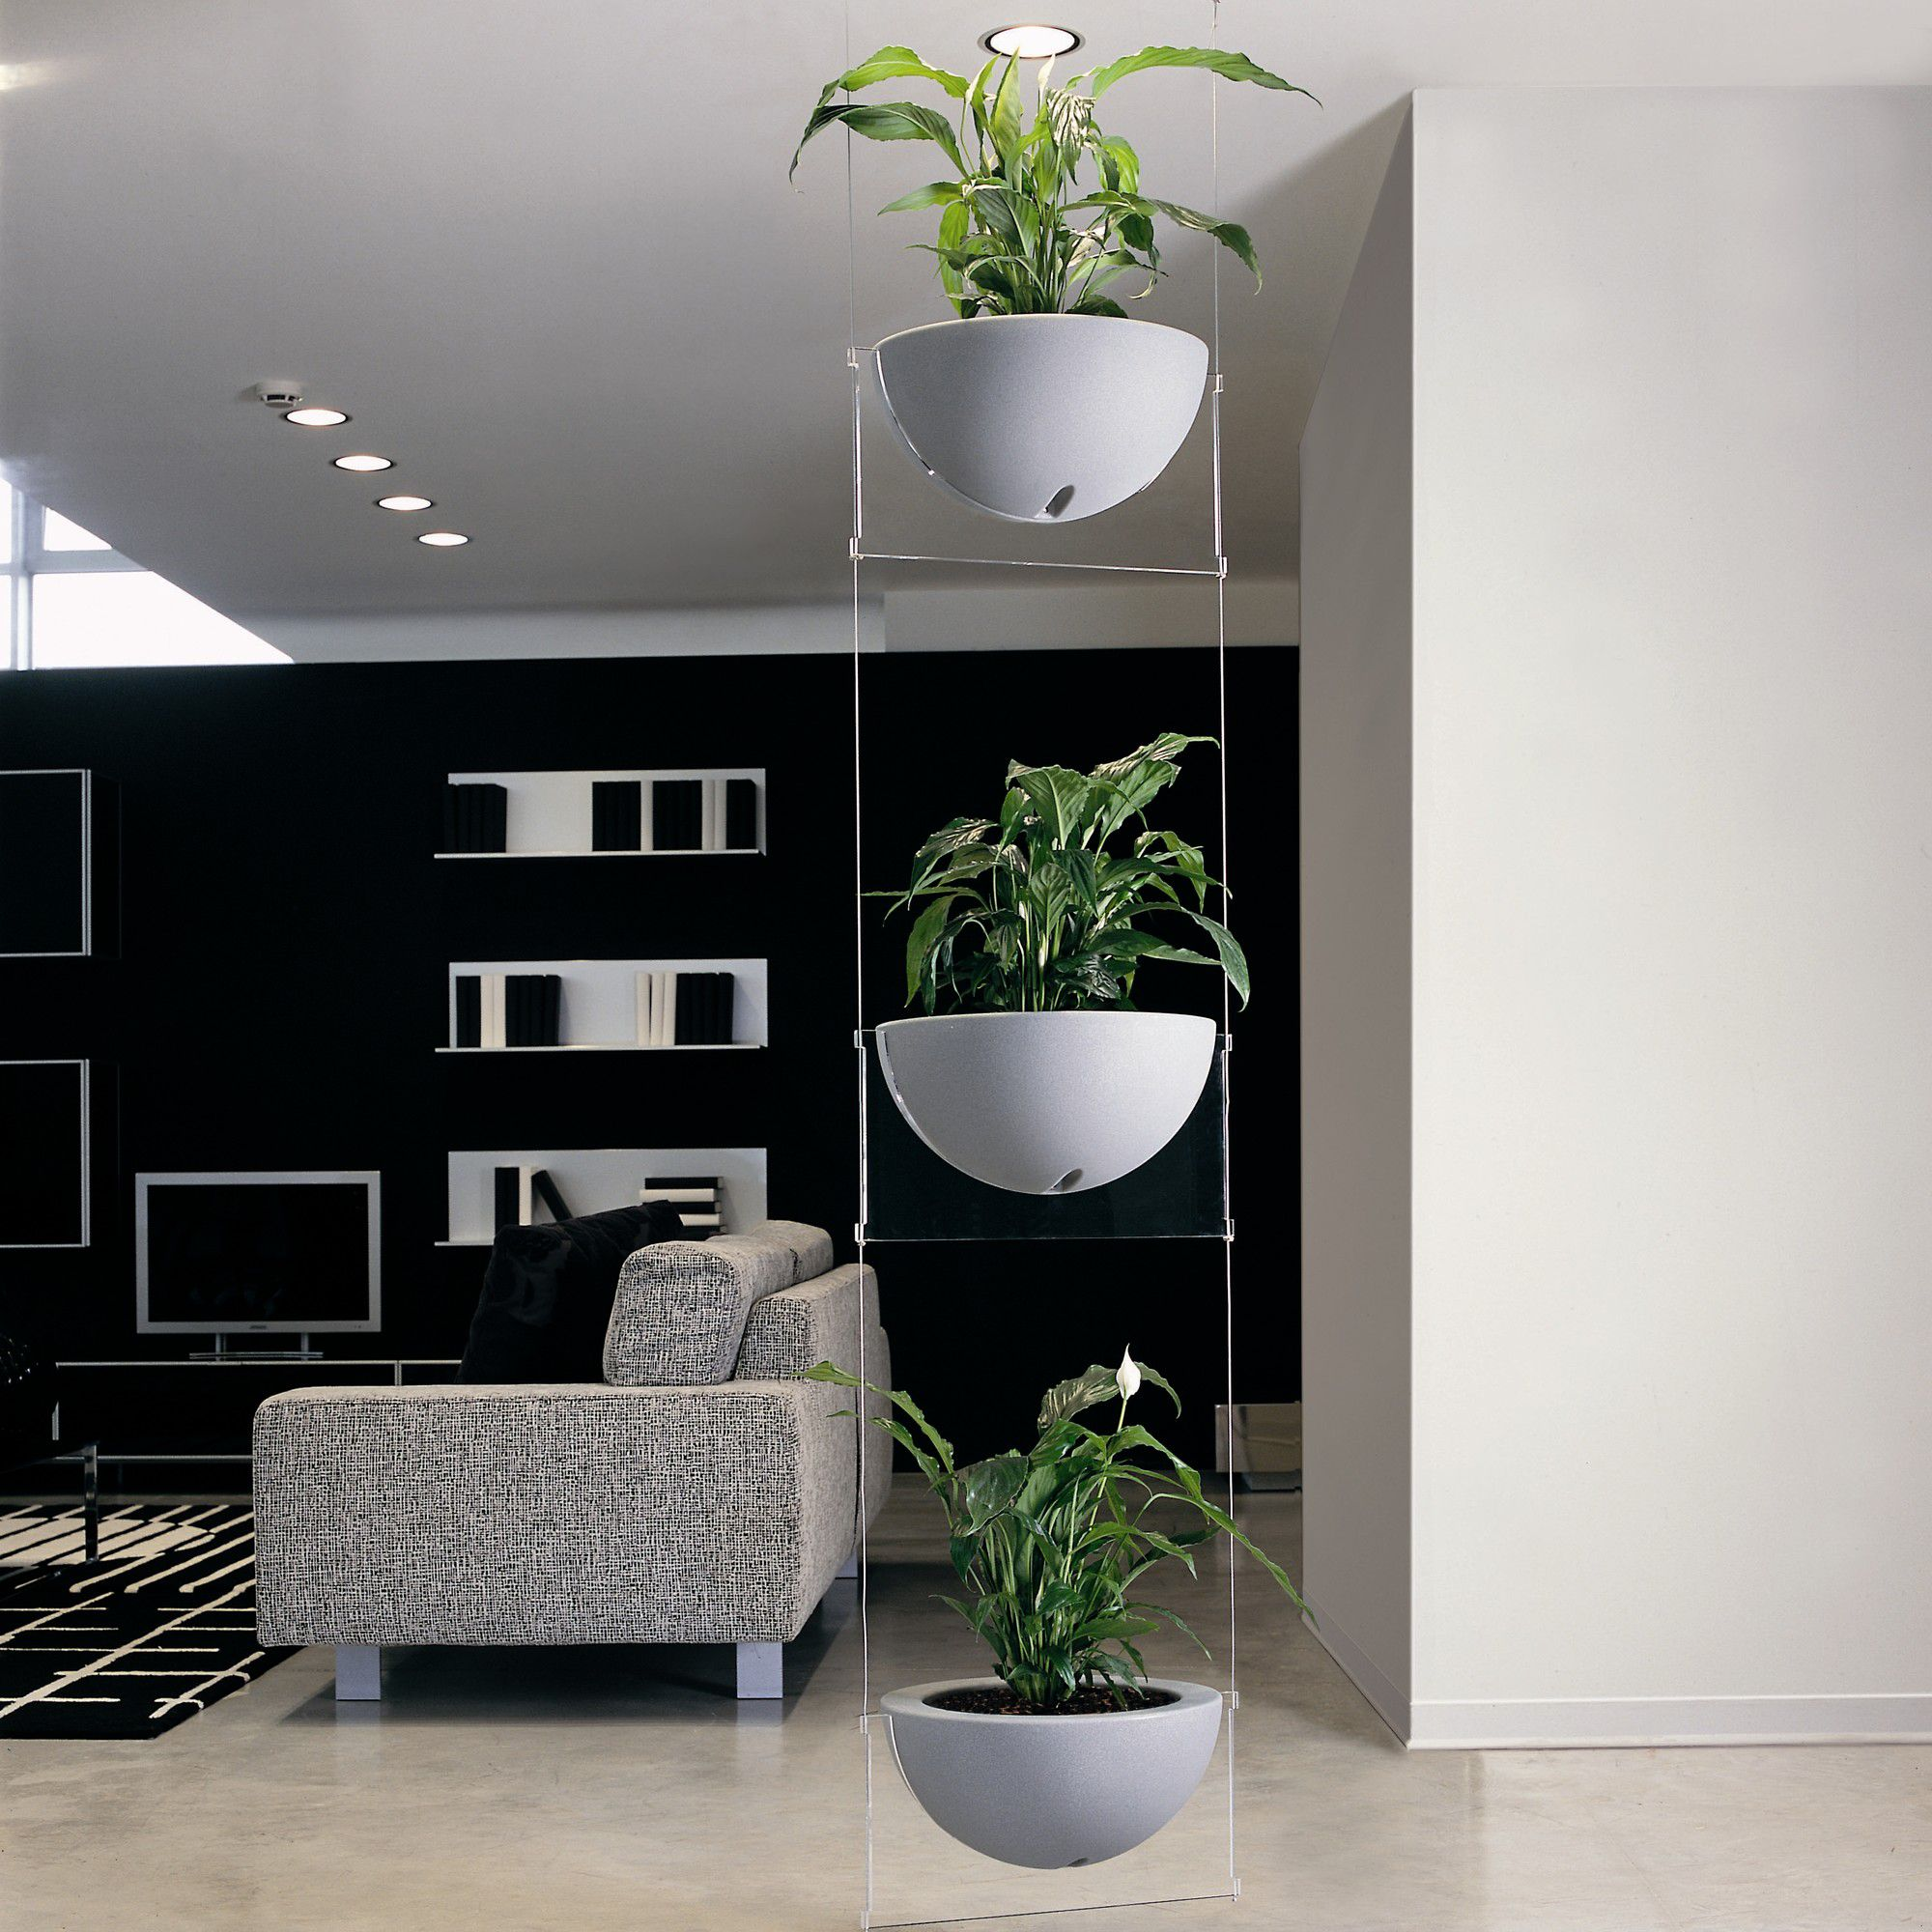 Emporium Positive Design Eebavoglio Triple Flower Tray - Green at Tesco Direct